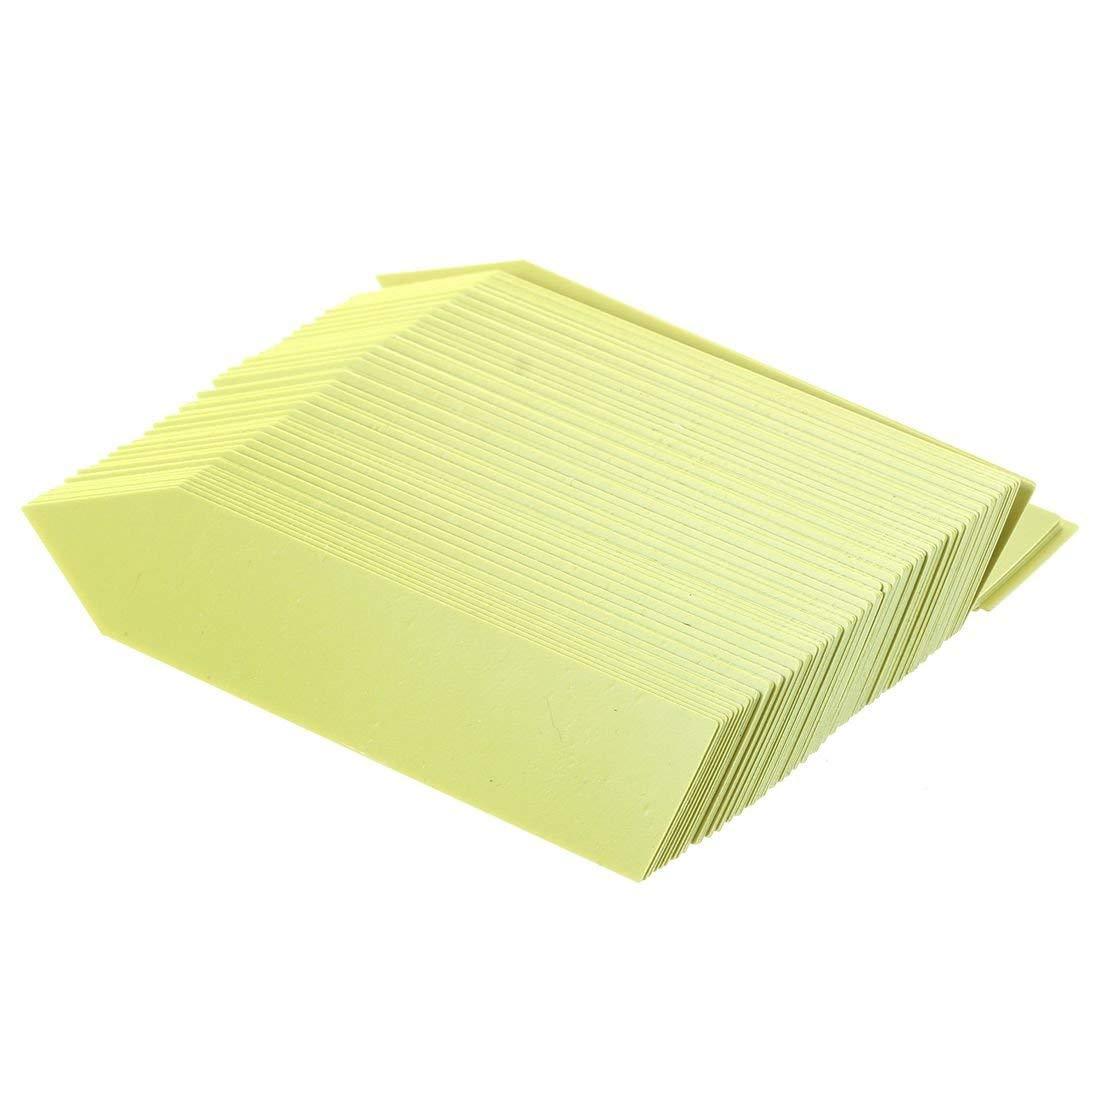 TOOGOO(R) 100 Pcs Plastic Plant Seed Labels Pot Marker Nursery Garden Stake Tags 10cm x 2cm (yellow)